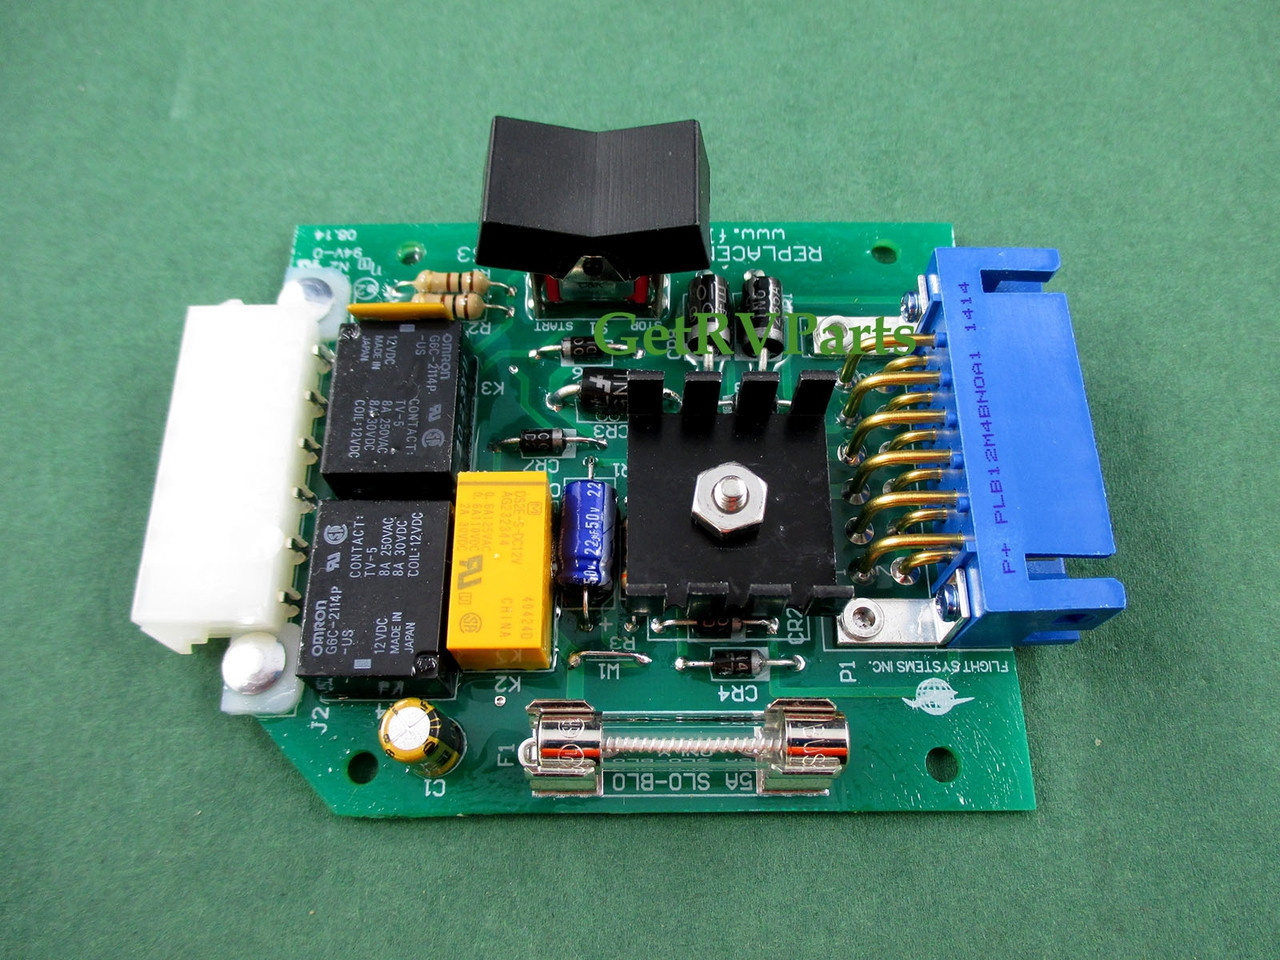 hight resolution of onan aftermarket 300 3763 01 generator circuit board by flight systems rh getrvparts com onan generator manual onan generator troubleshooting